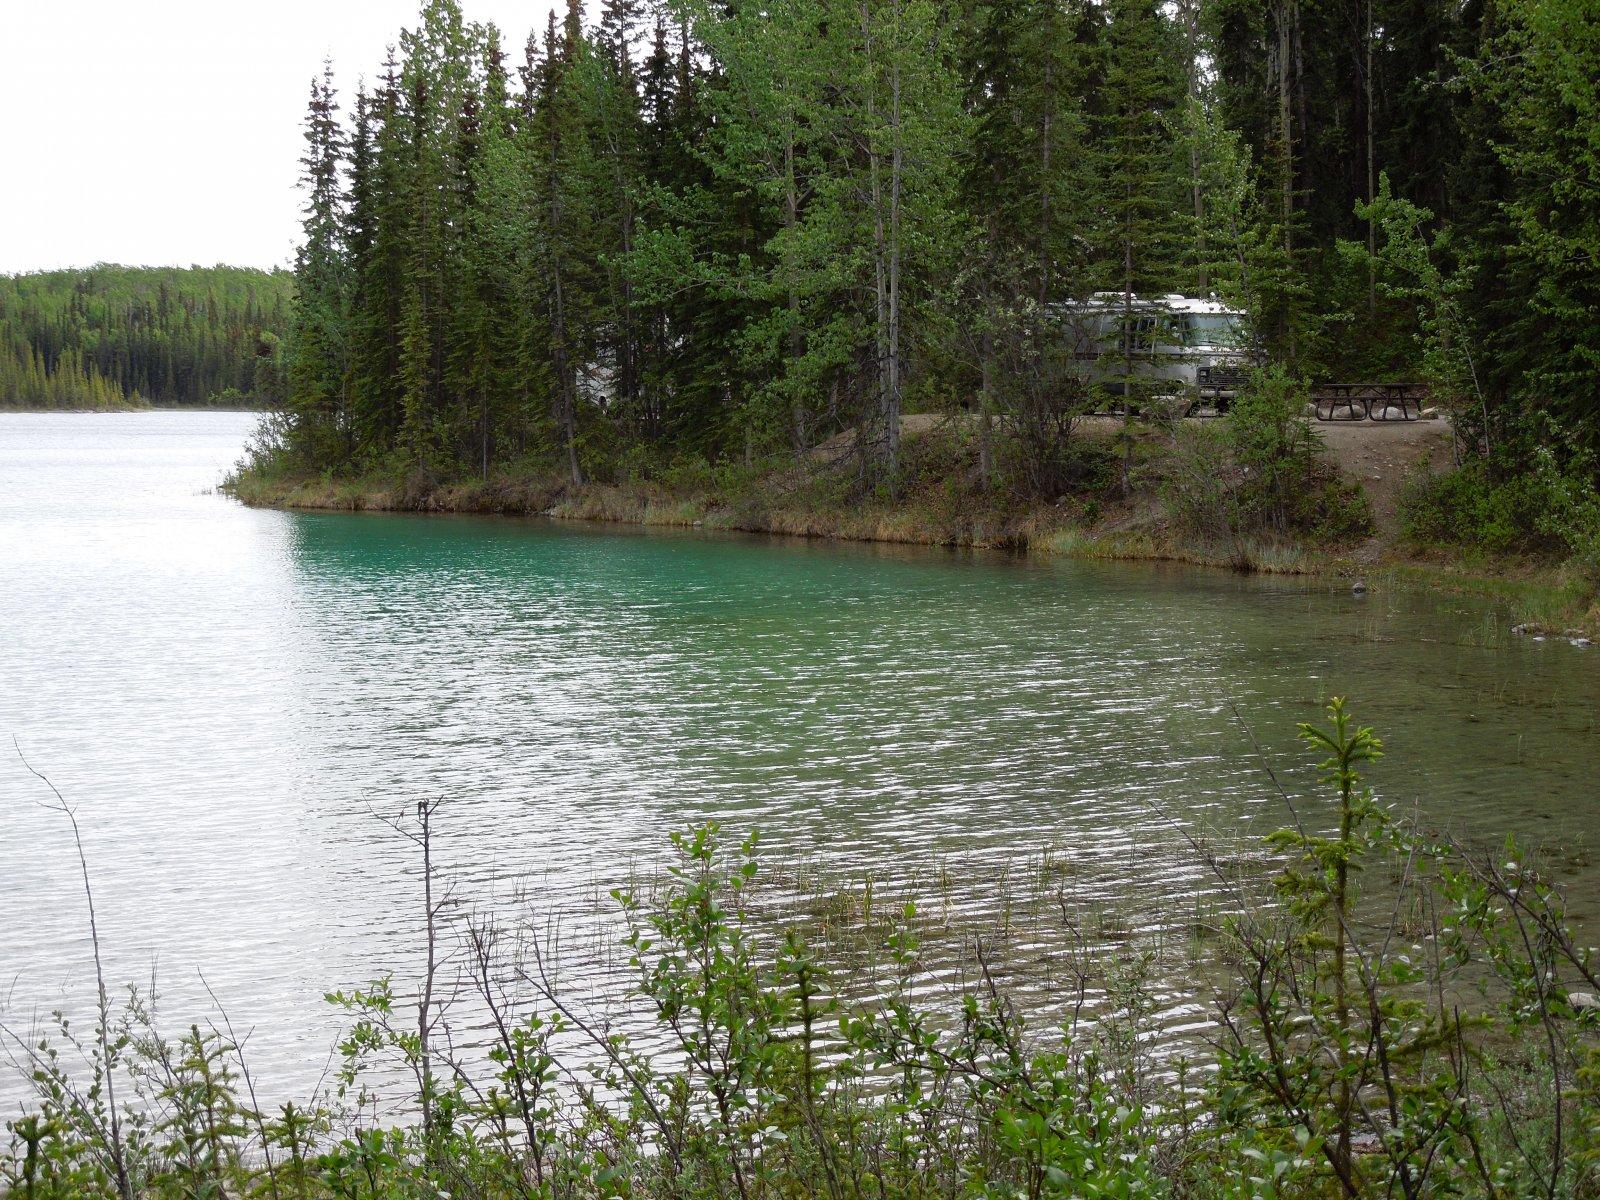 Click image for larger version  Name:Meziadin Lake to Boya Lake 169.jpg Views:117 Size:618.0 KB ID:214309